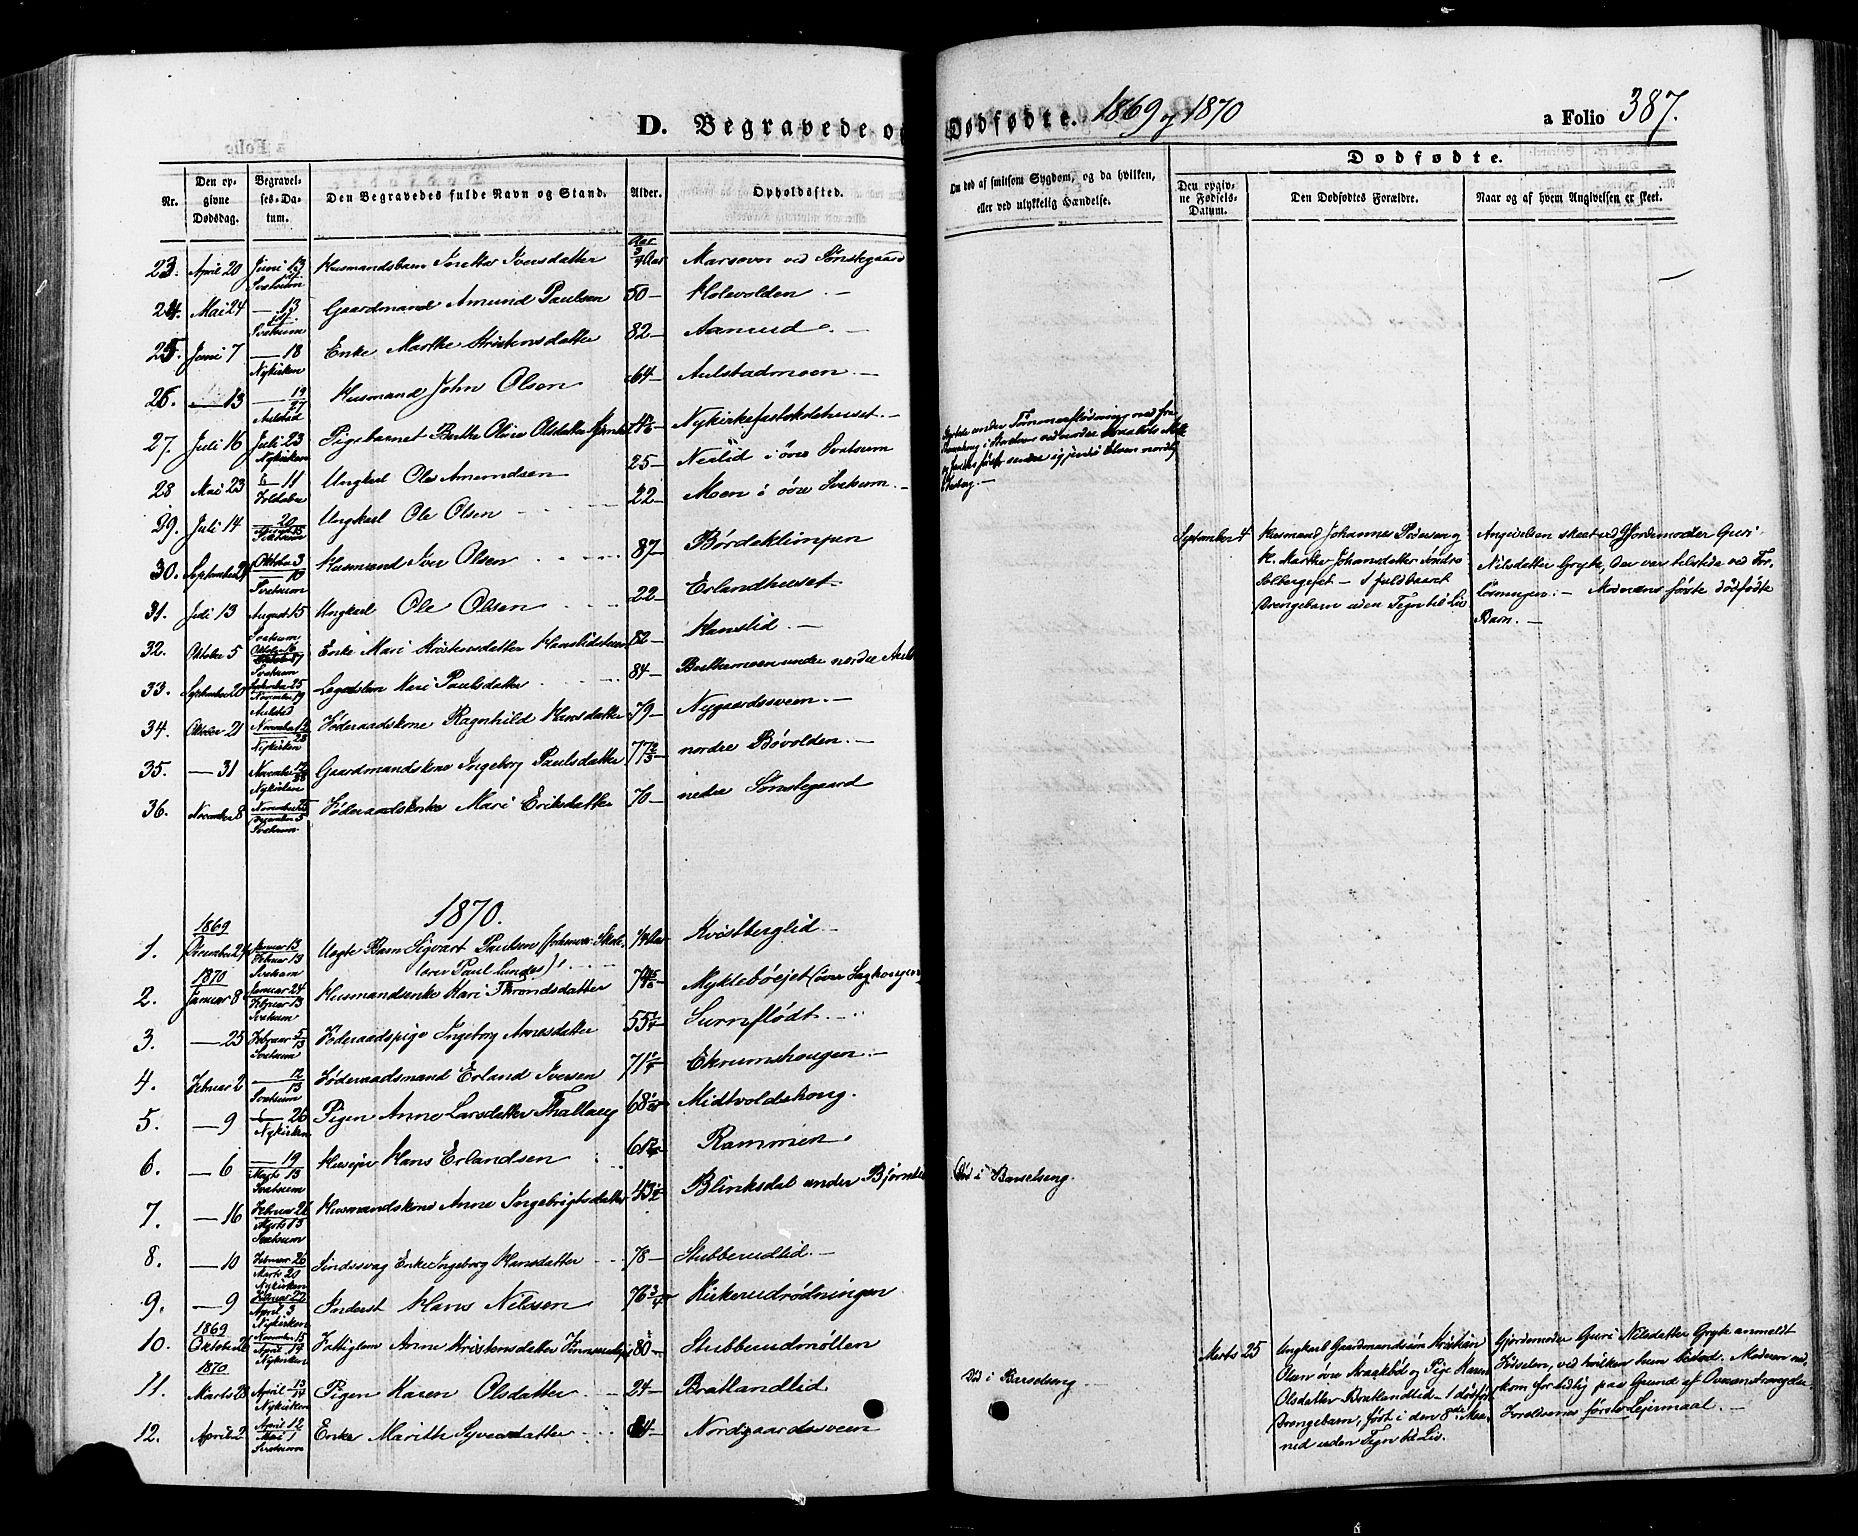 SAH, Gausdal prestekontor, Ministerialbok nr. 10, 1867-1886, s. 387